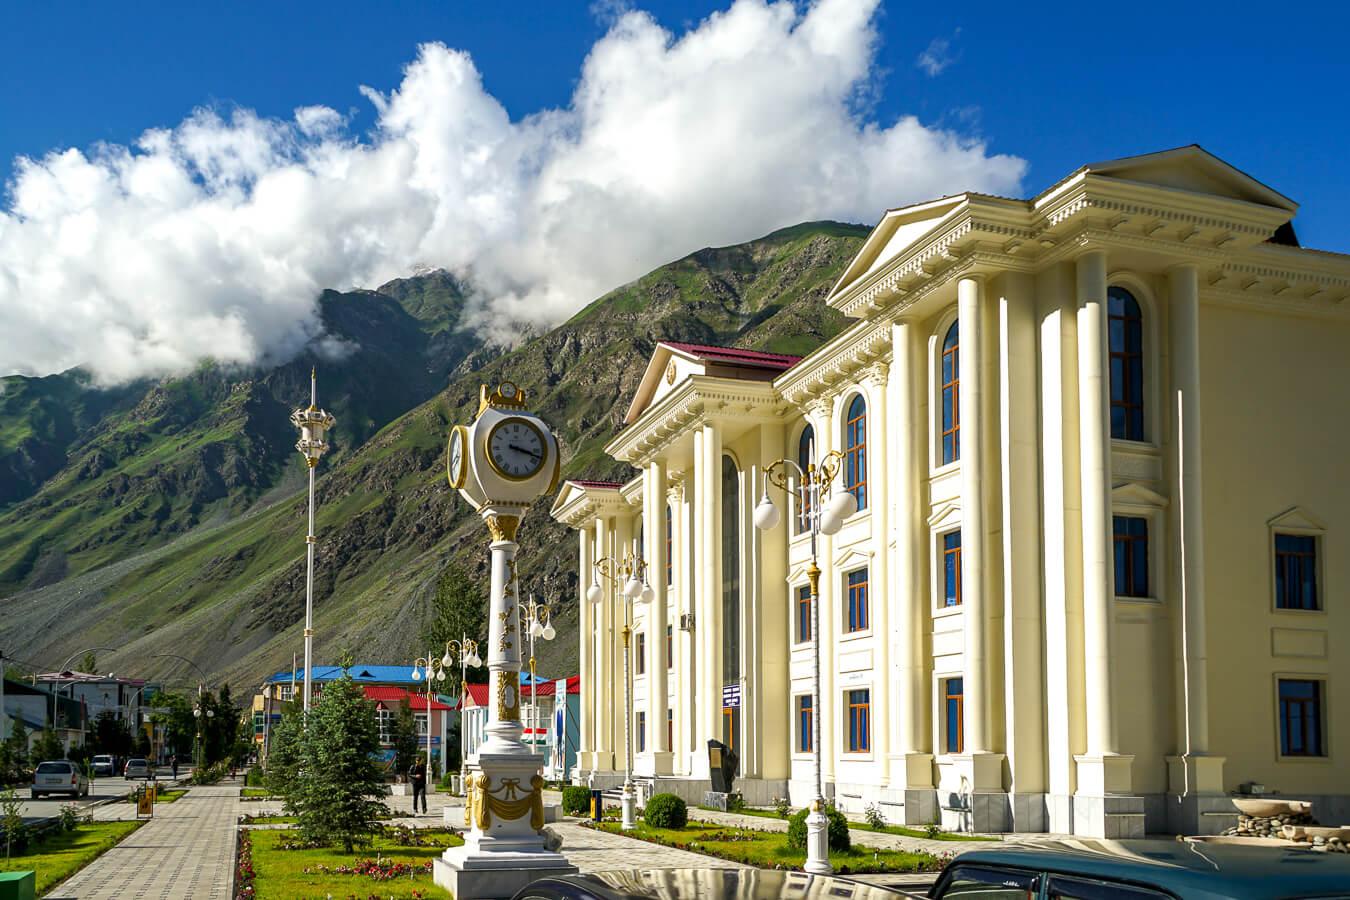 Kalai khum in Tajikistan